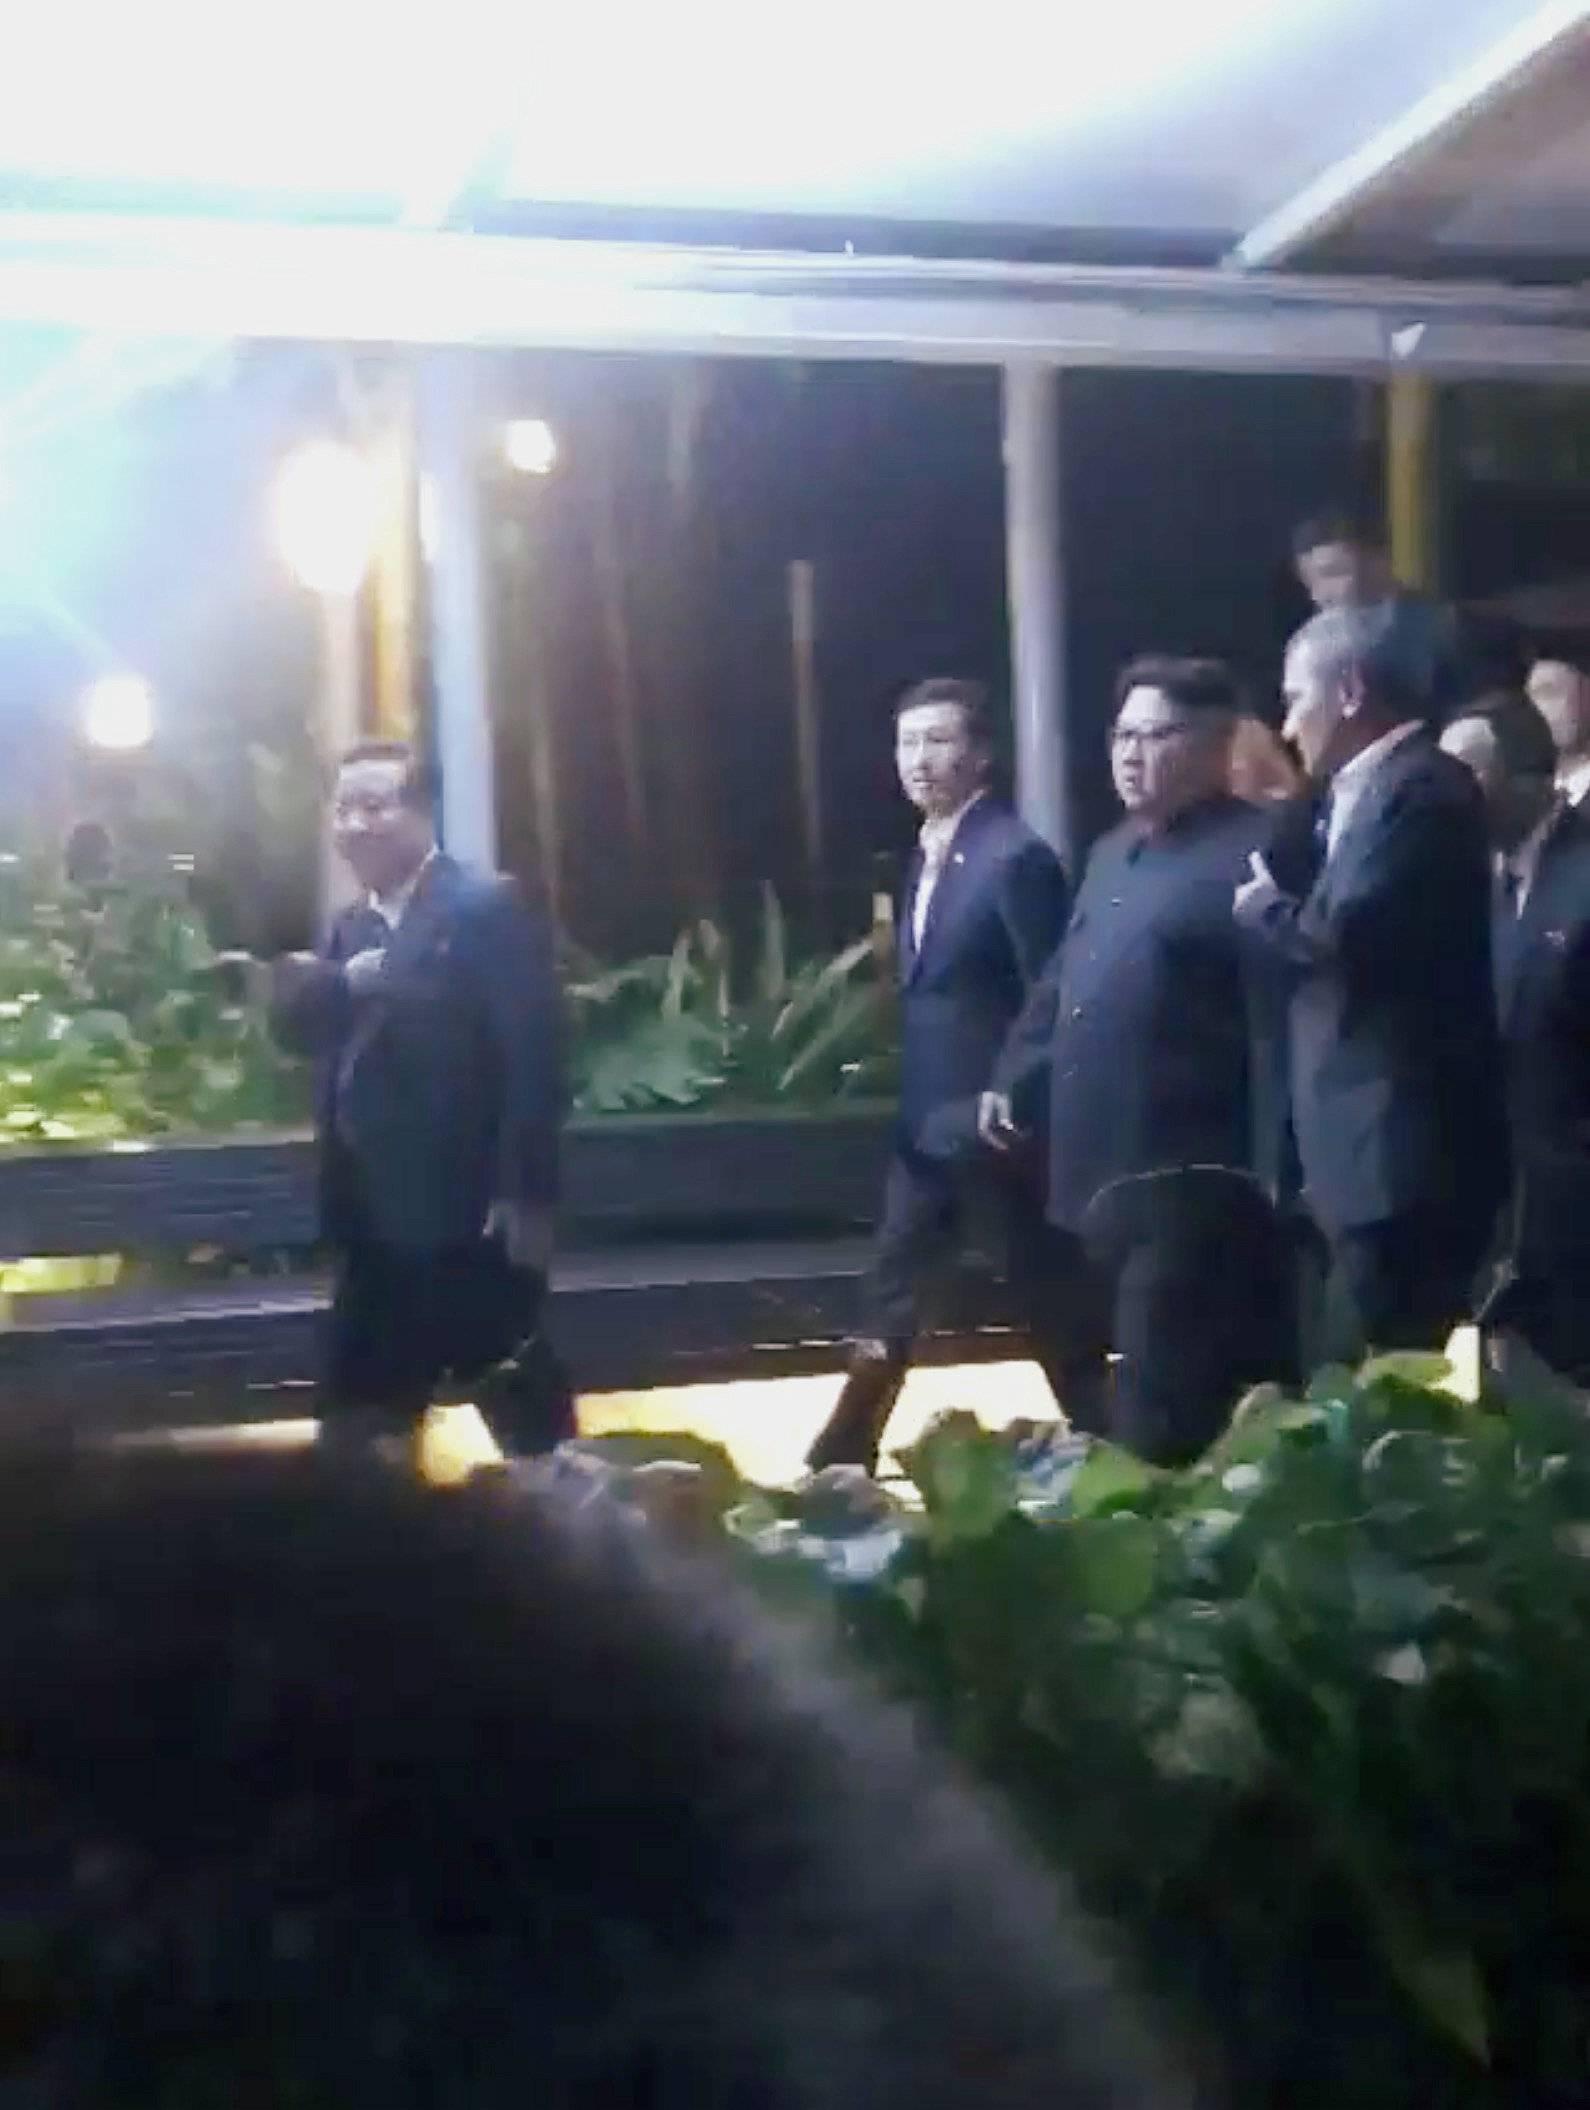 North Korea's leader Kim Jong Un is seen at Marina Bay Sands Skypark in Singapore